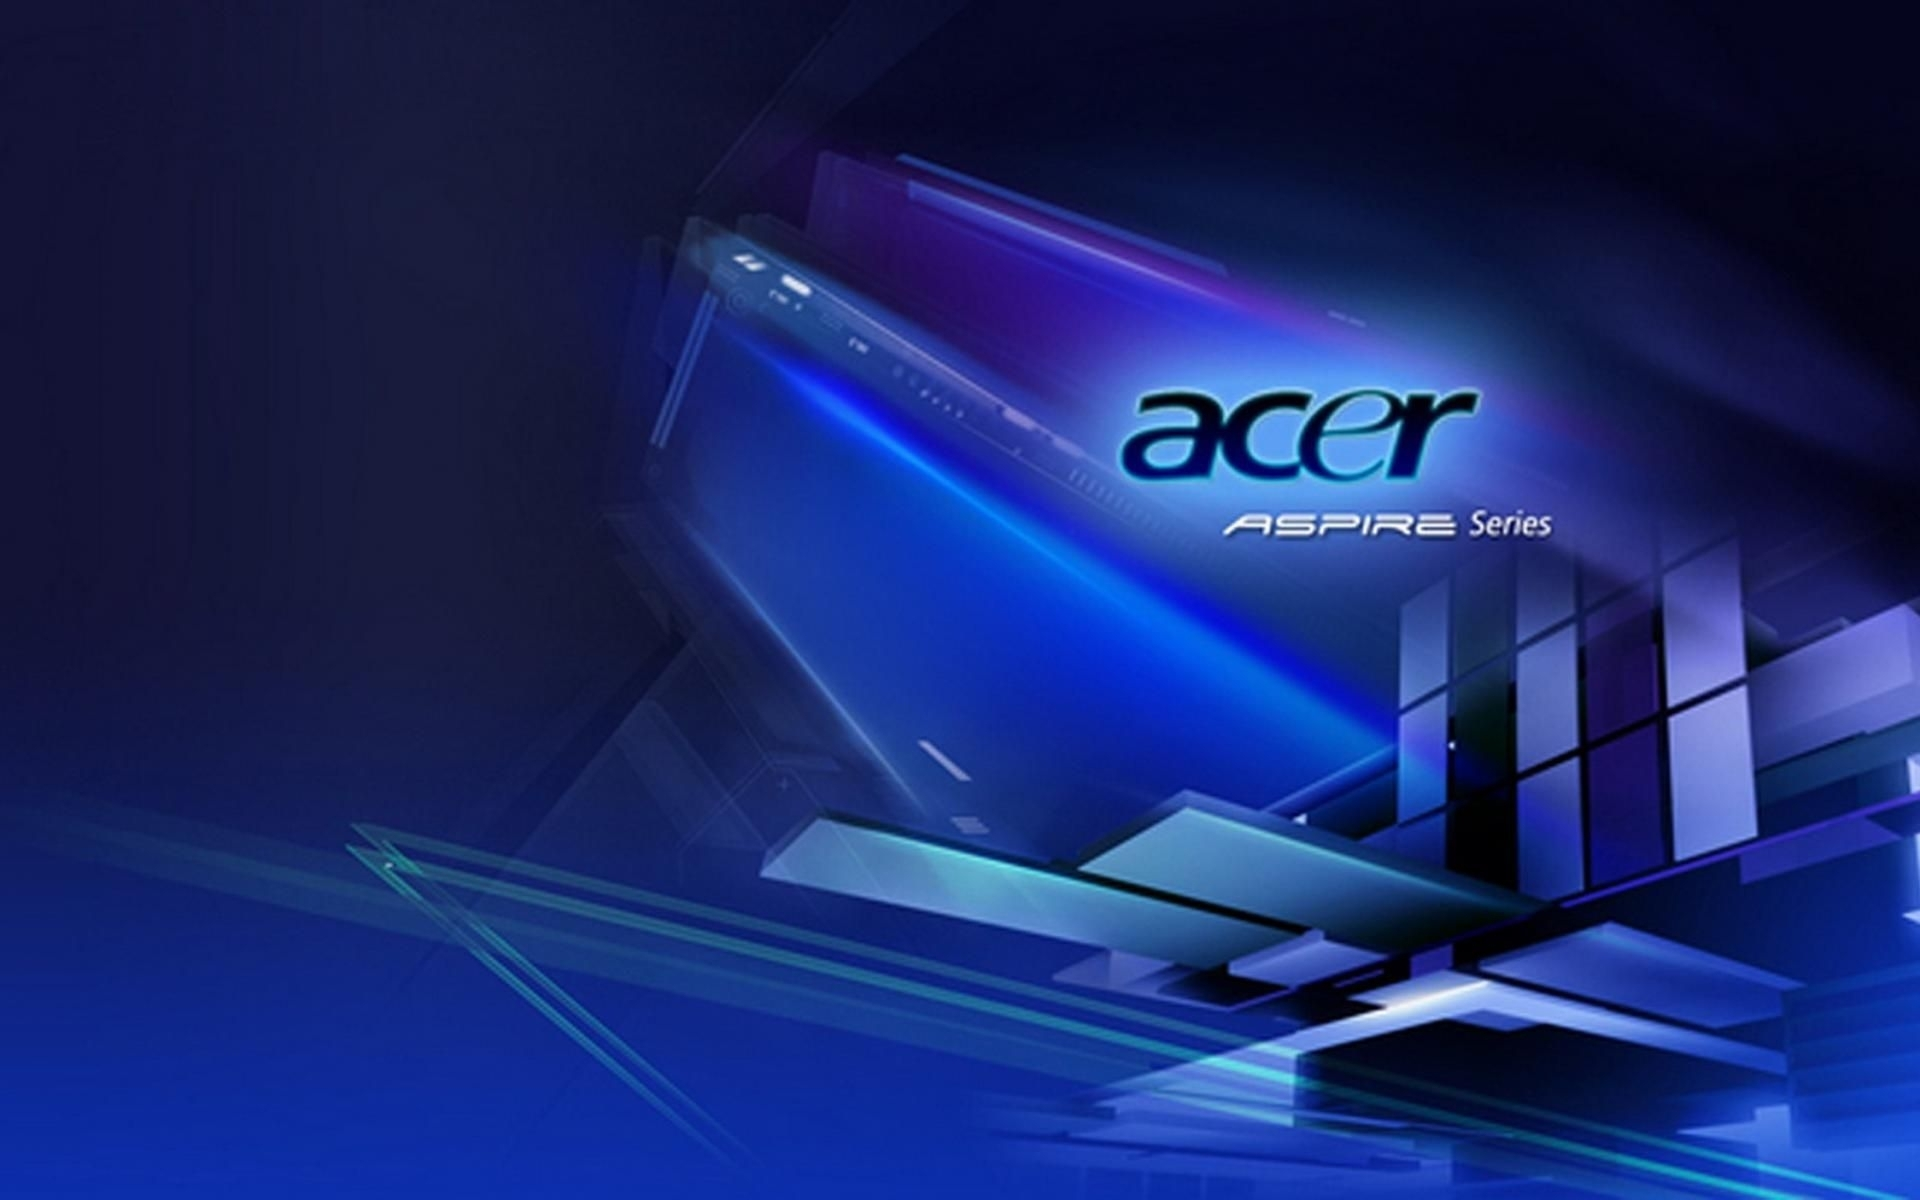 acer windows 10 wallpaper, super hdq acer windows 10 images (super